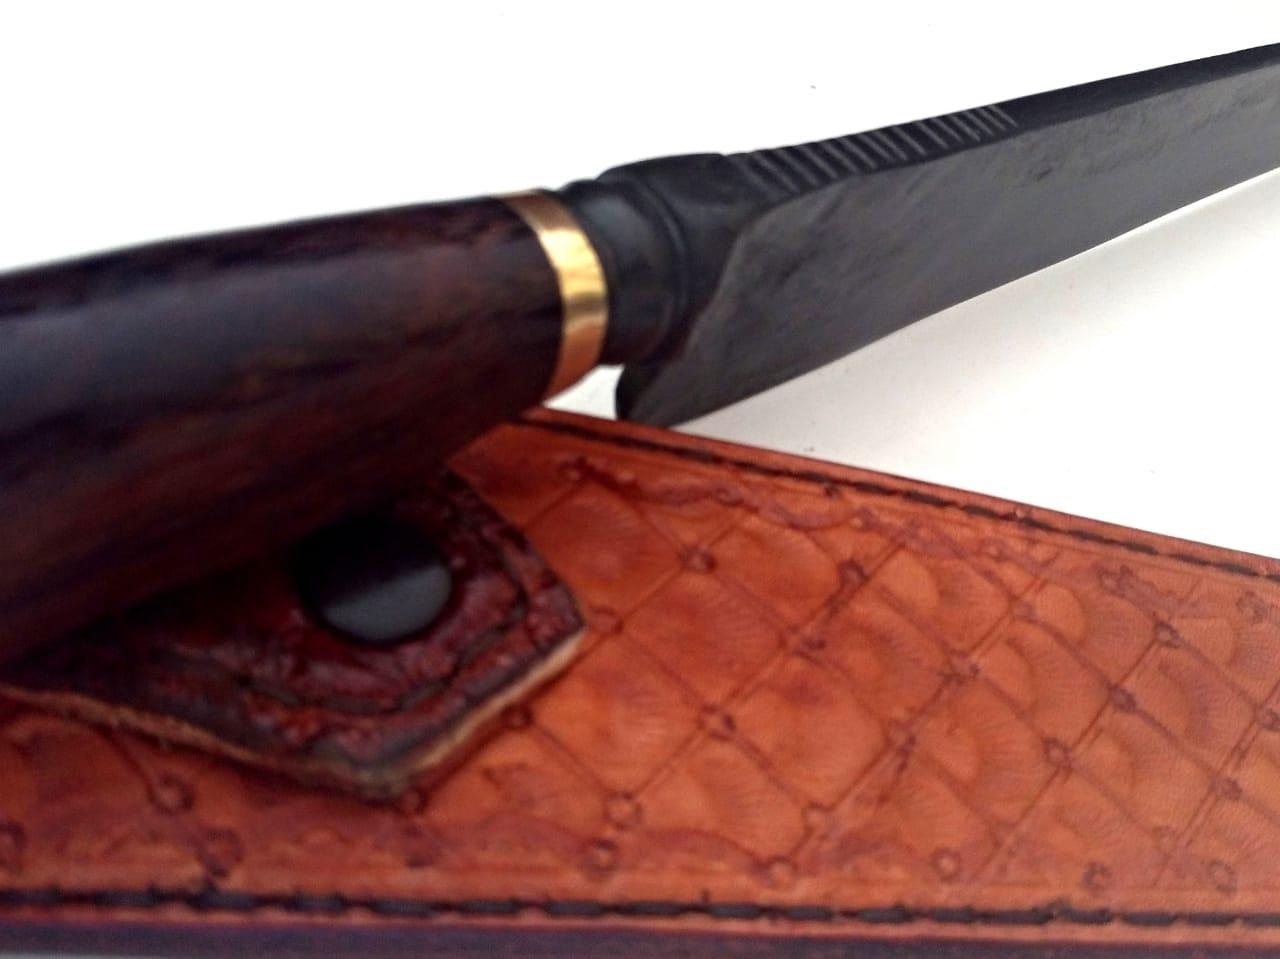 Faca artesanal forjada carandawood 10 polegadas